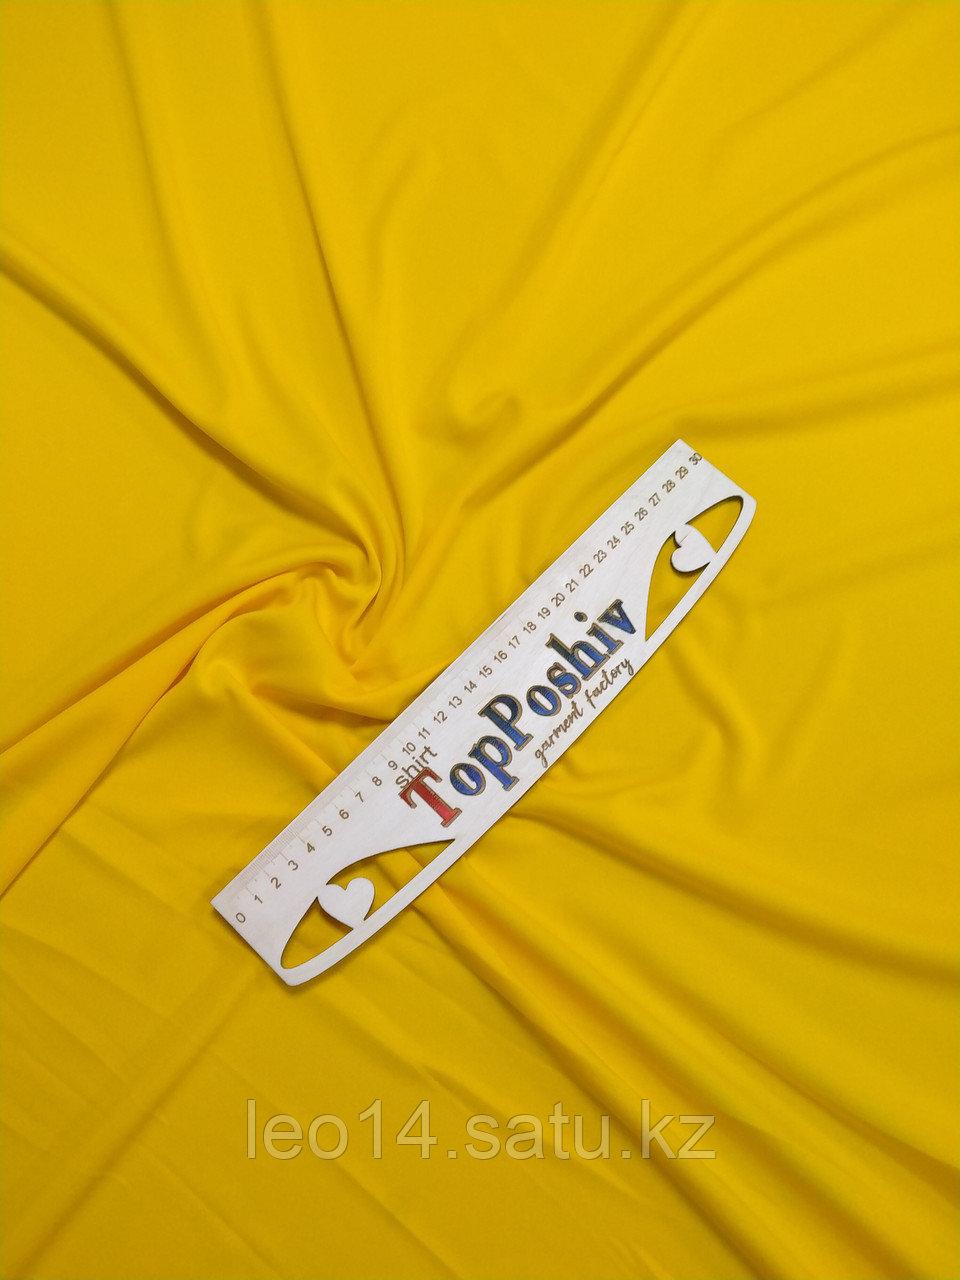 "Ткань Прима Микрофибра ""ЛЕТО Премиум Плюс"", Термотрансфер, 168 см, Желтая канарейка"